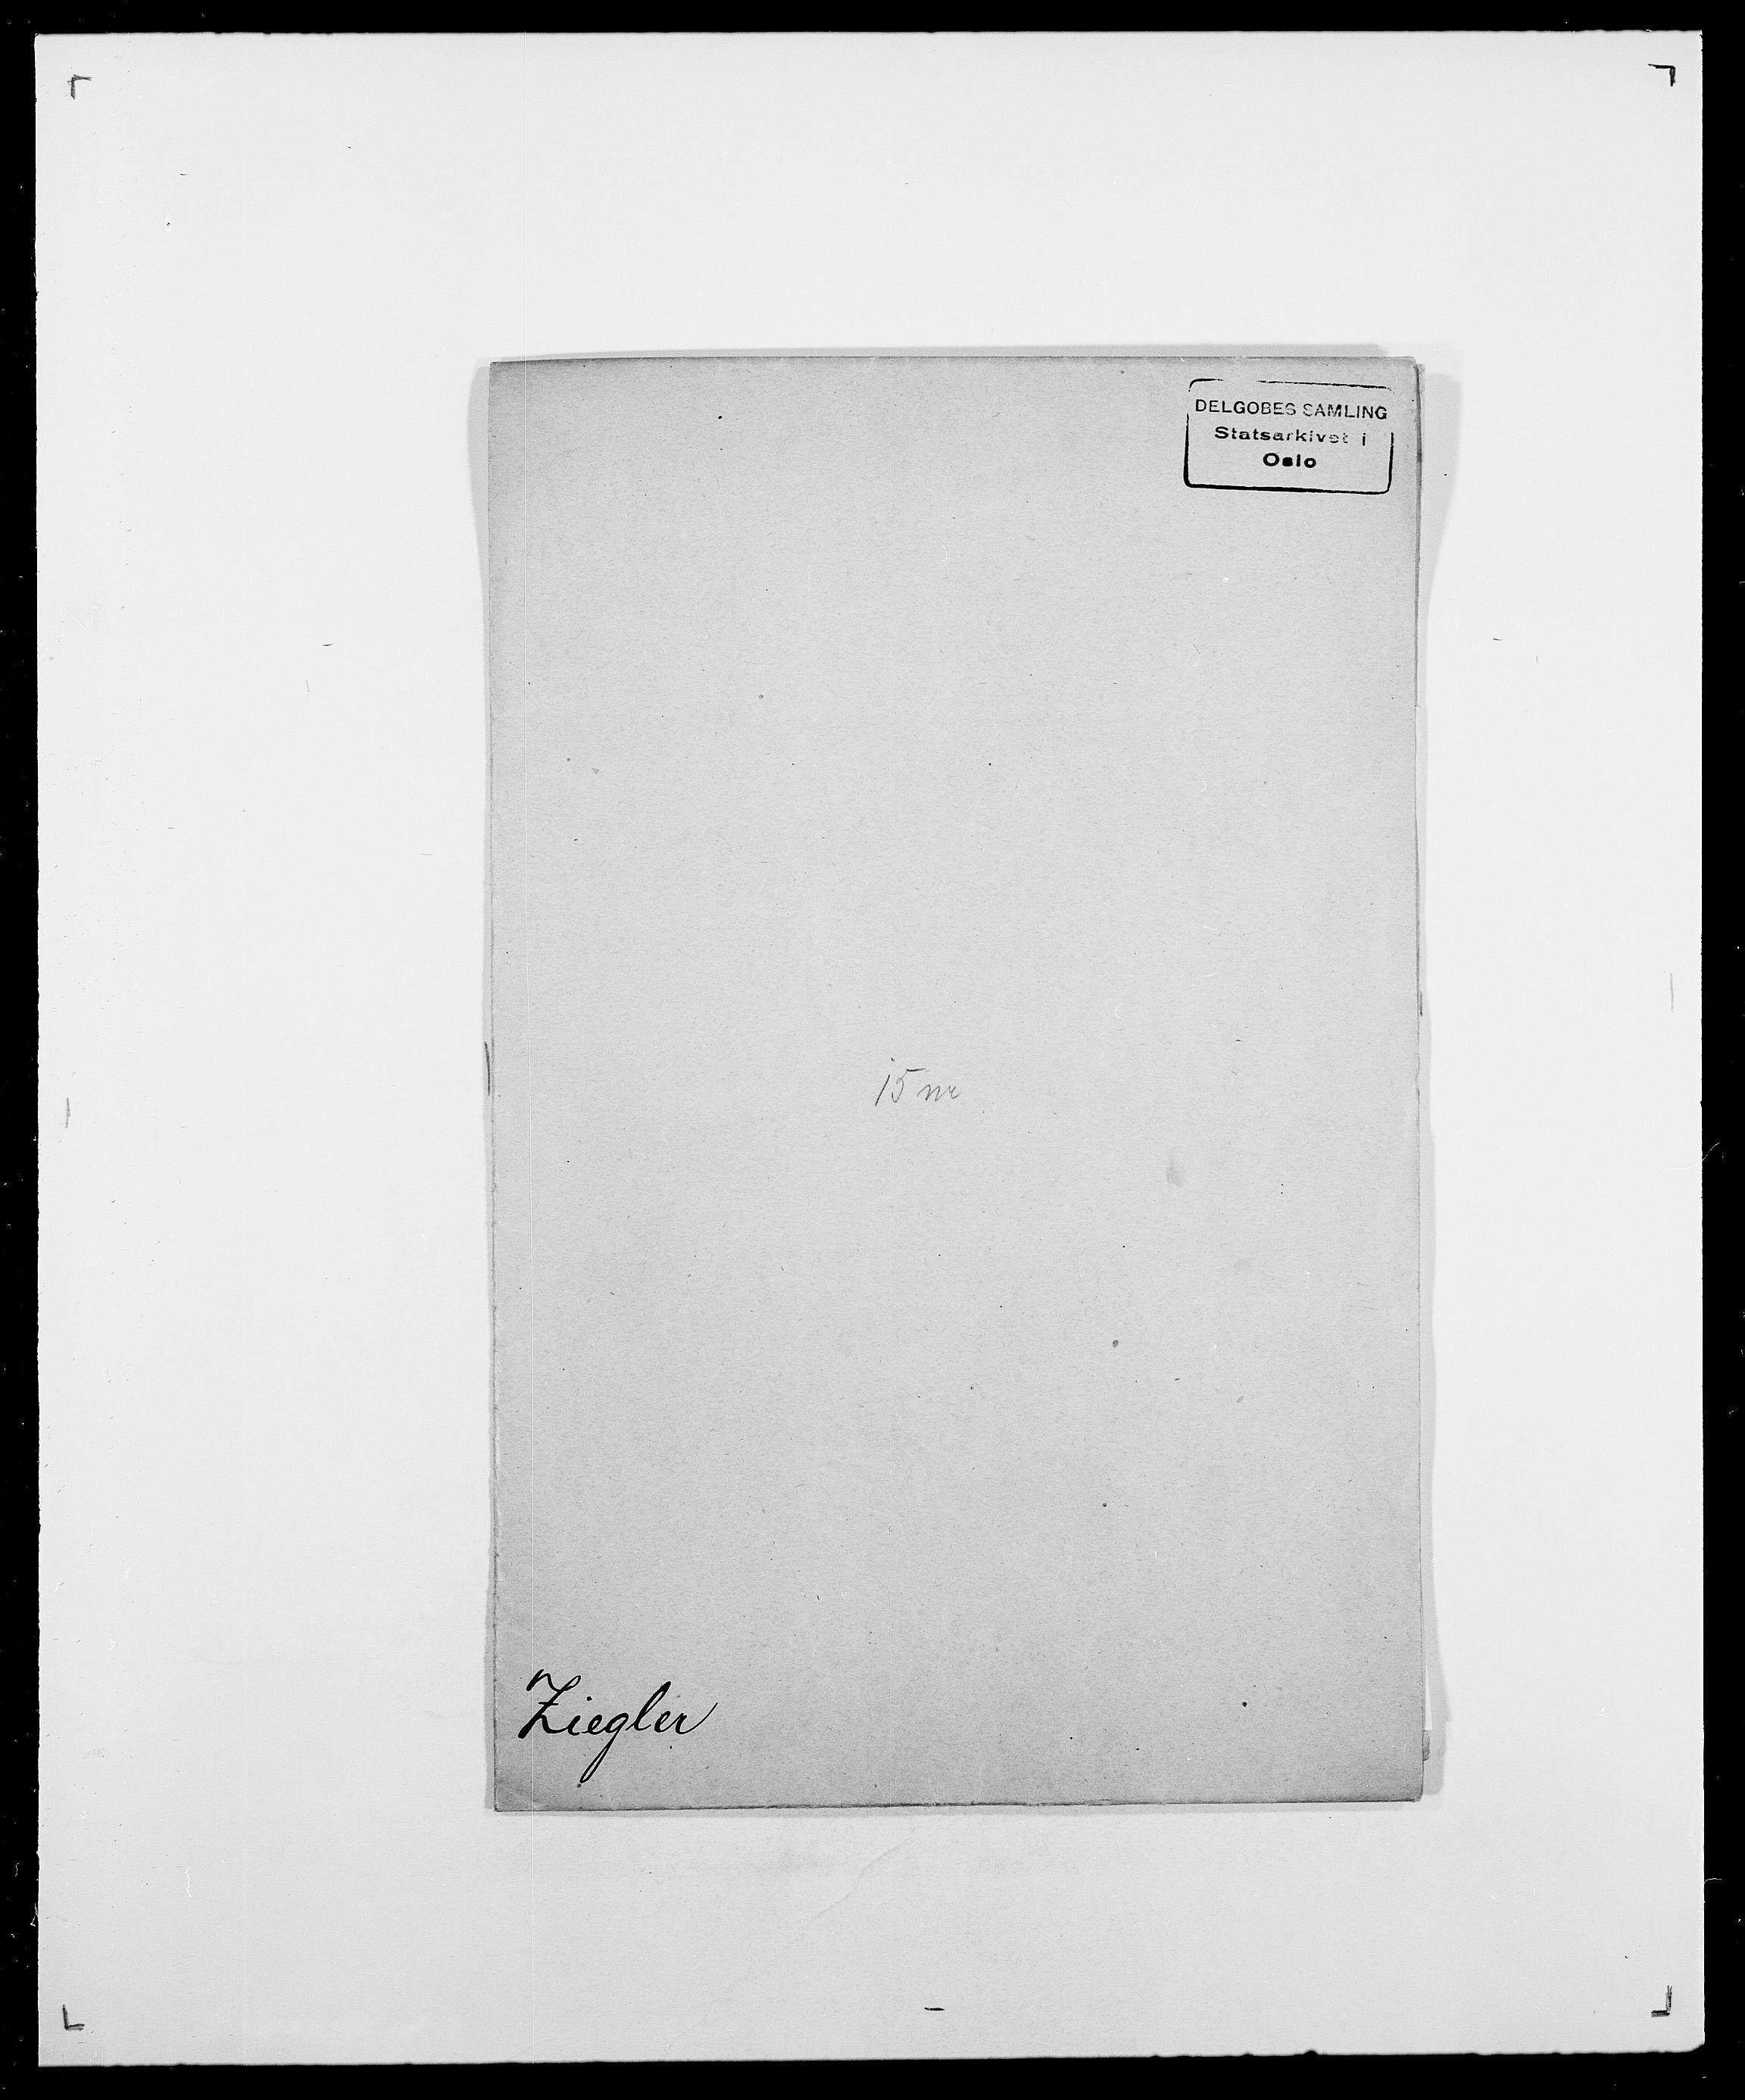 SAO, Delgobe, Charles Antoine - samling, D/Da/L0043: Wulfsberg - v. Zanten, s. 126